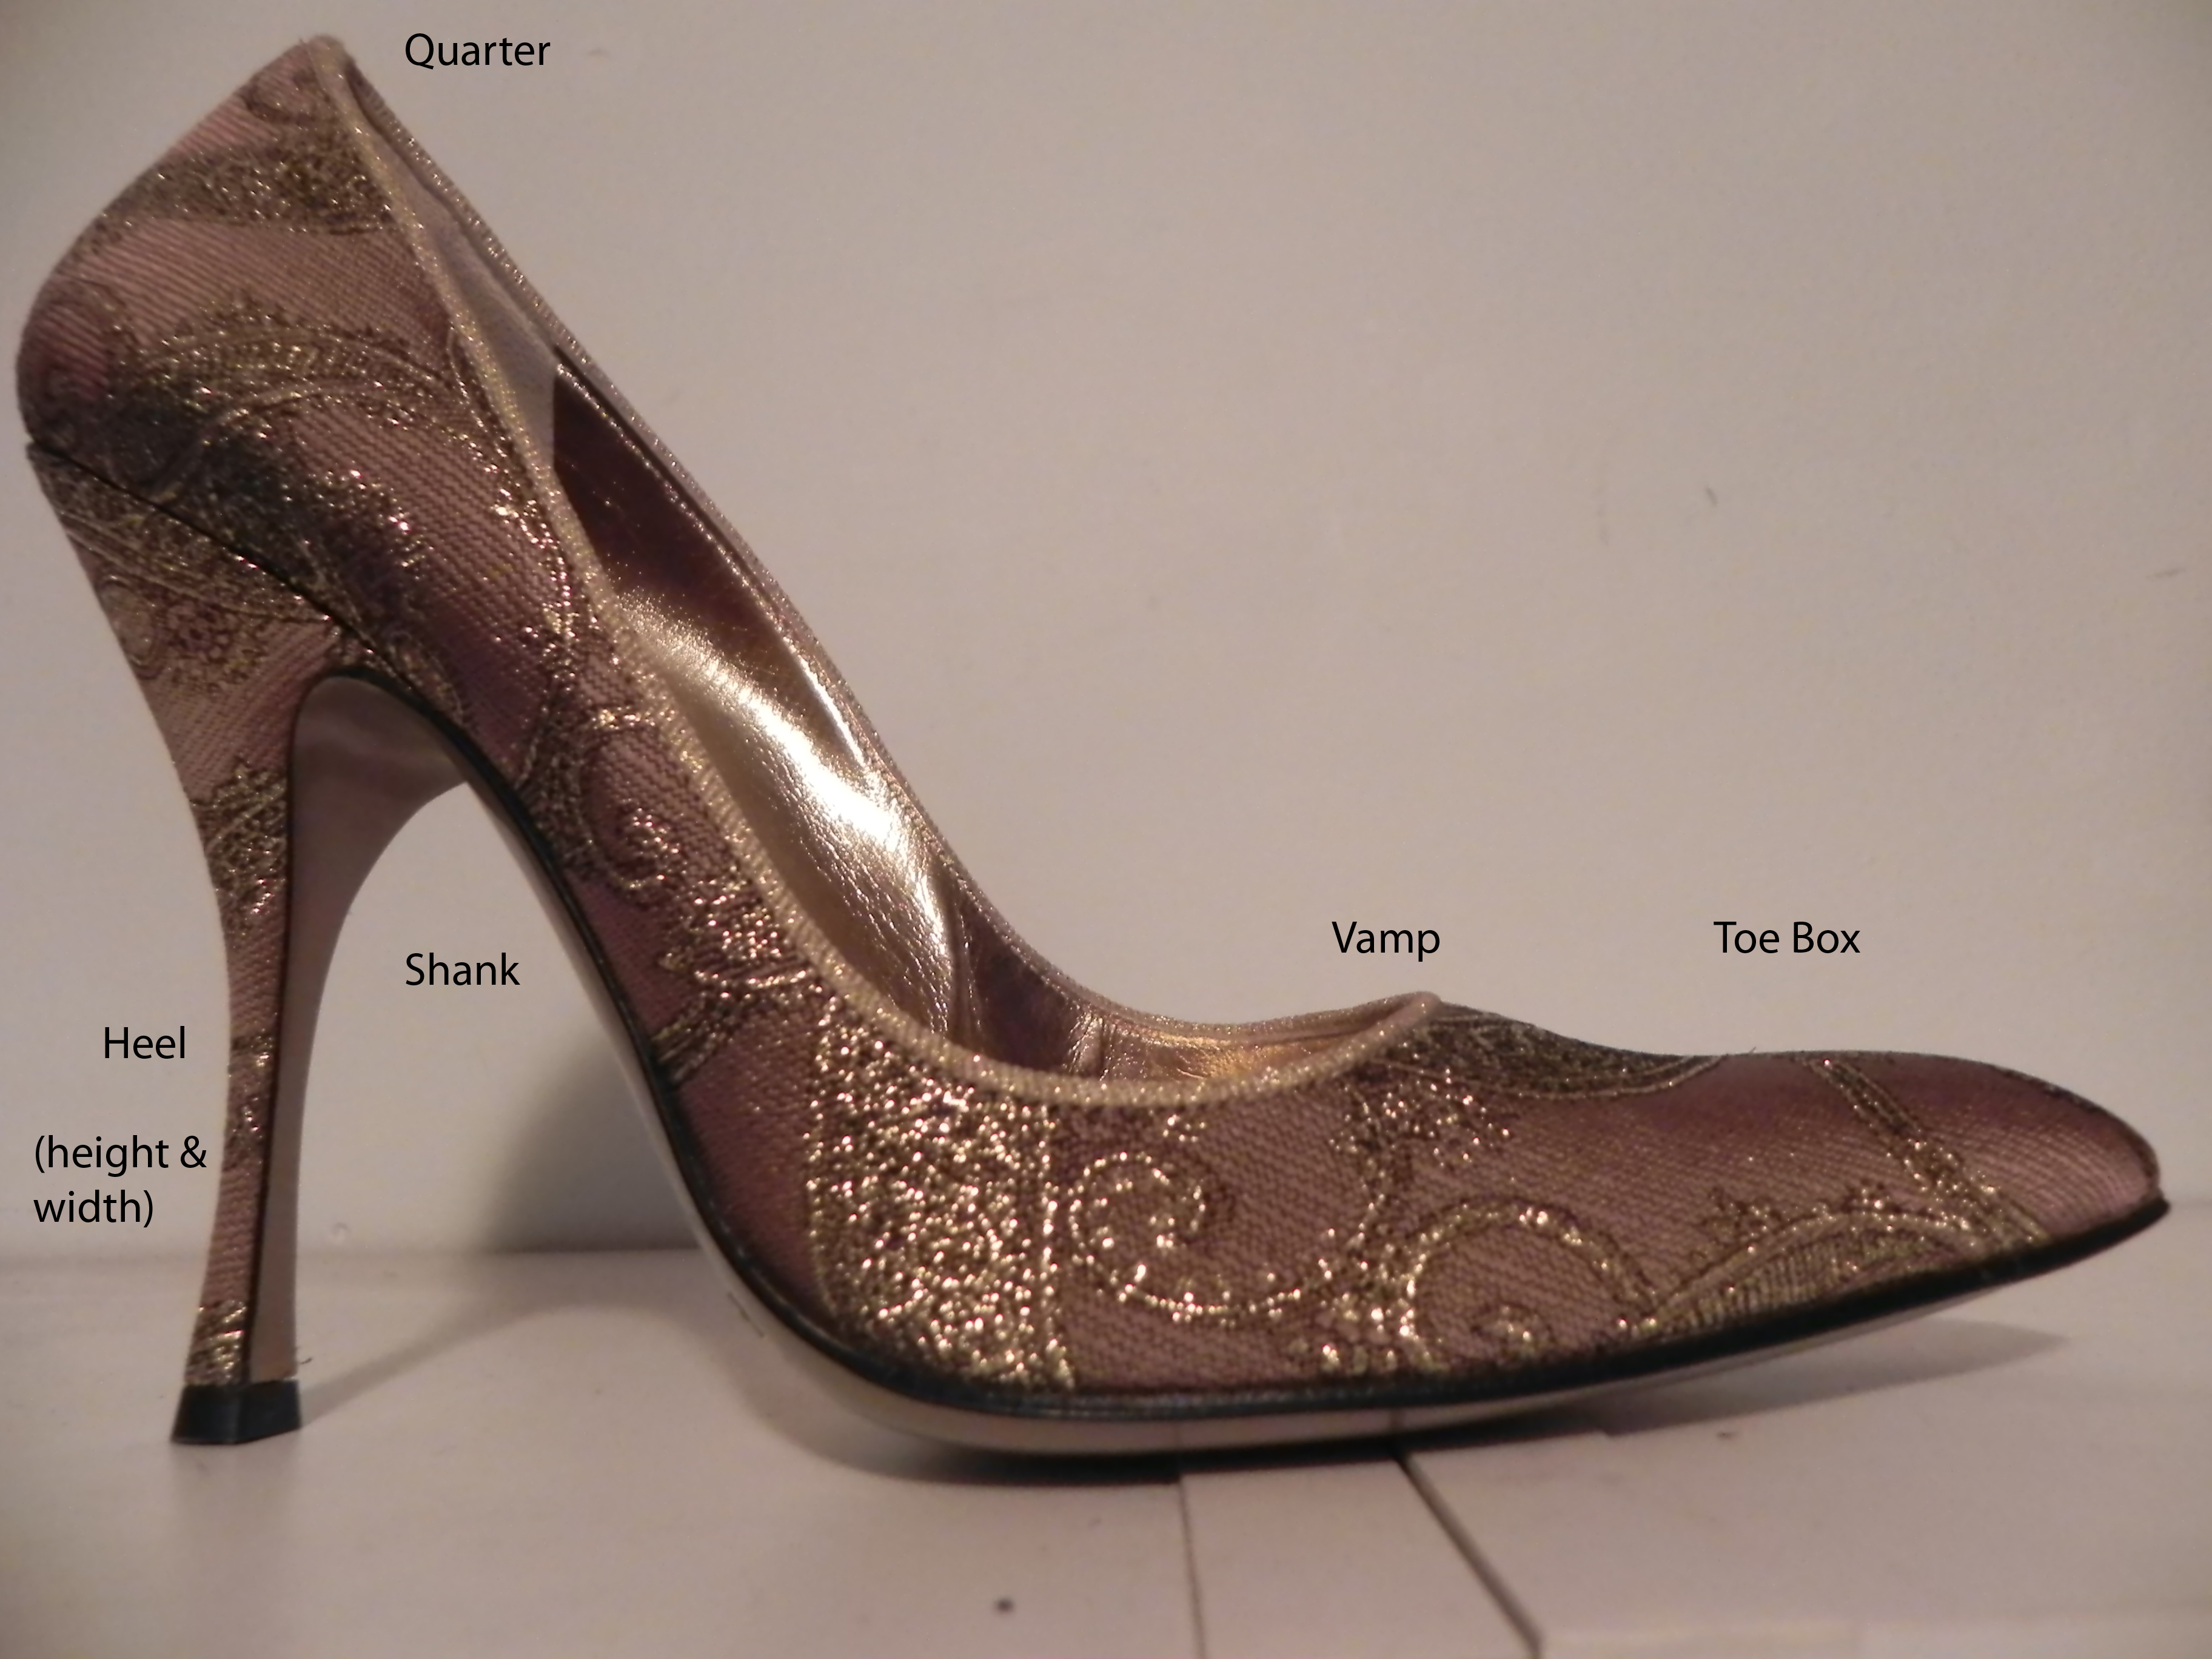 The Anatomy Of A High Heel